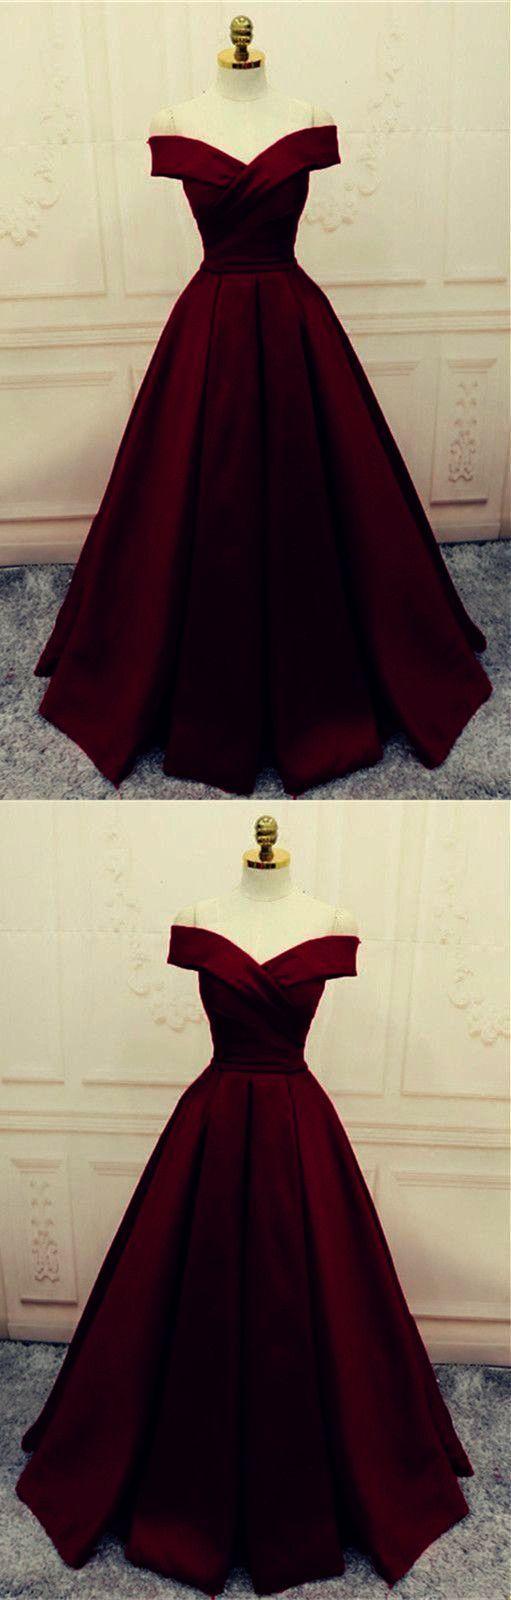 Breathtaking ue formal dresses plus size stores dresses